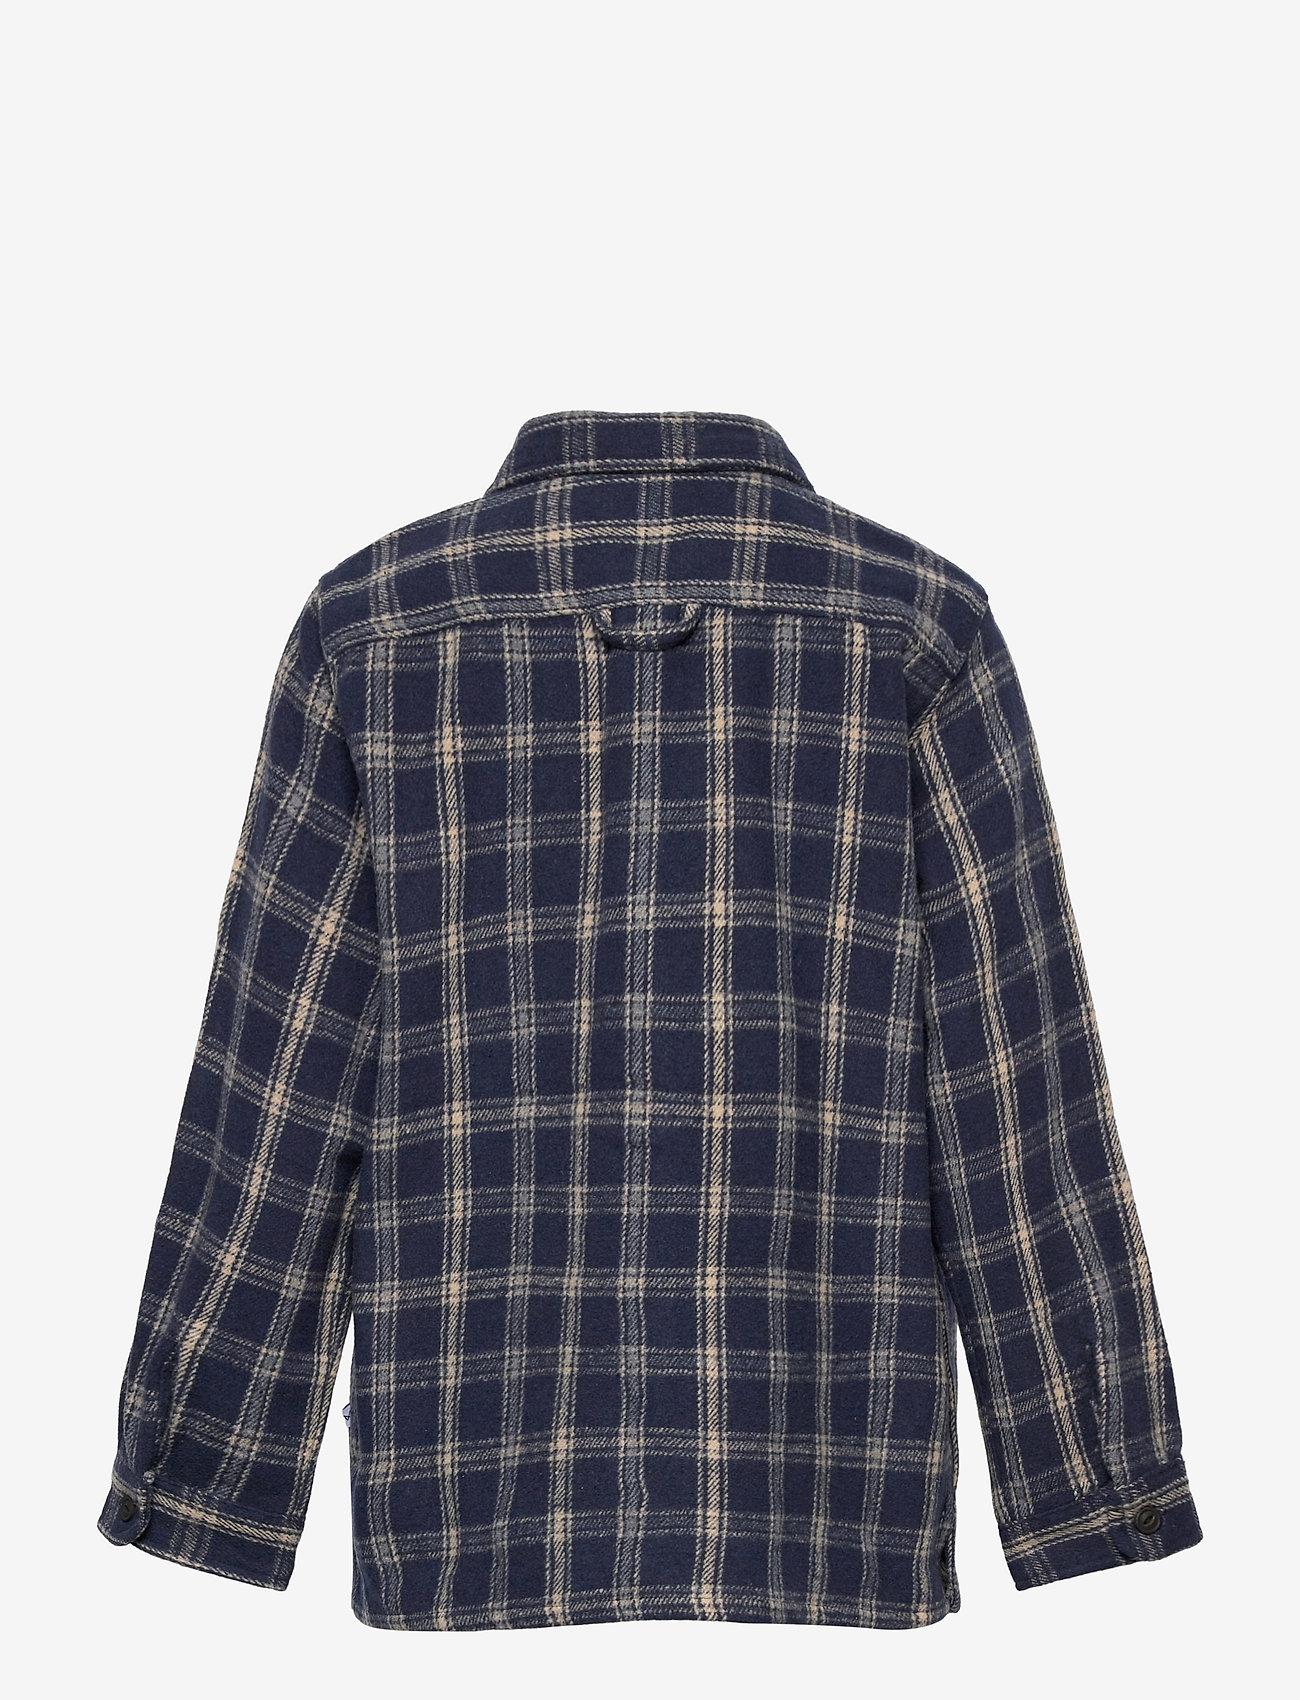 Kronstadt - Oliver Check - shirts - navy - 1